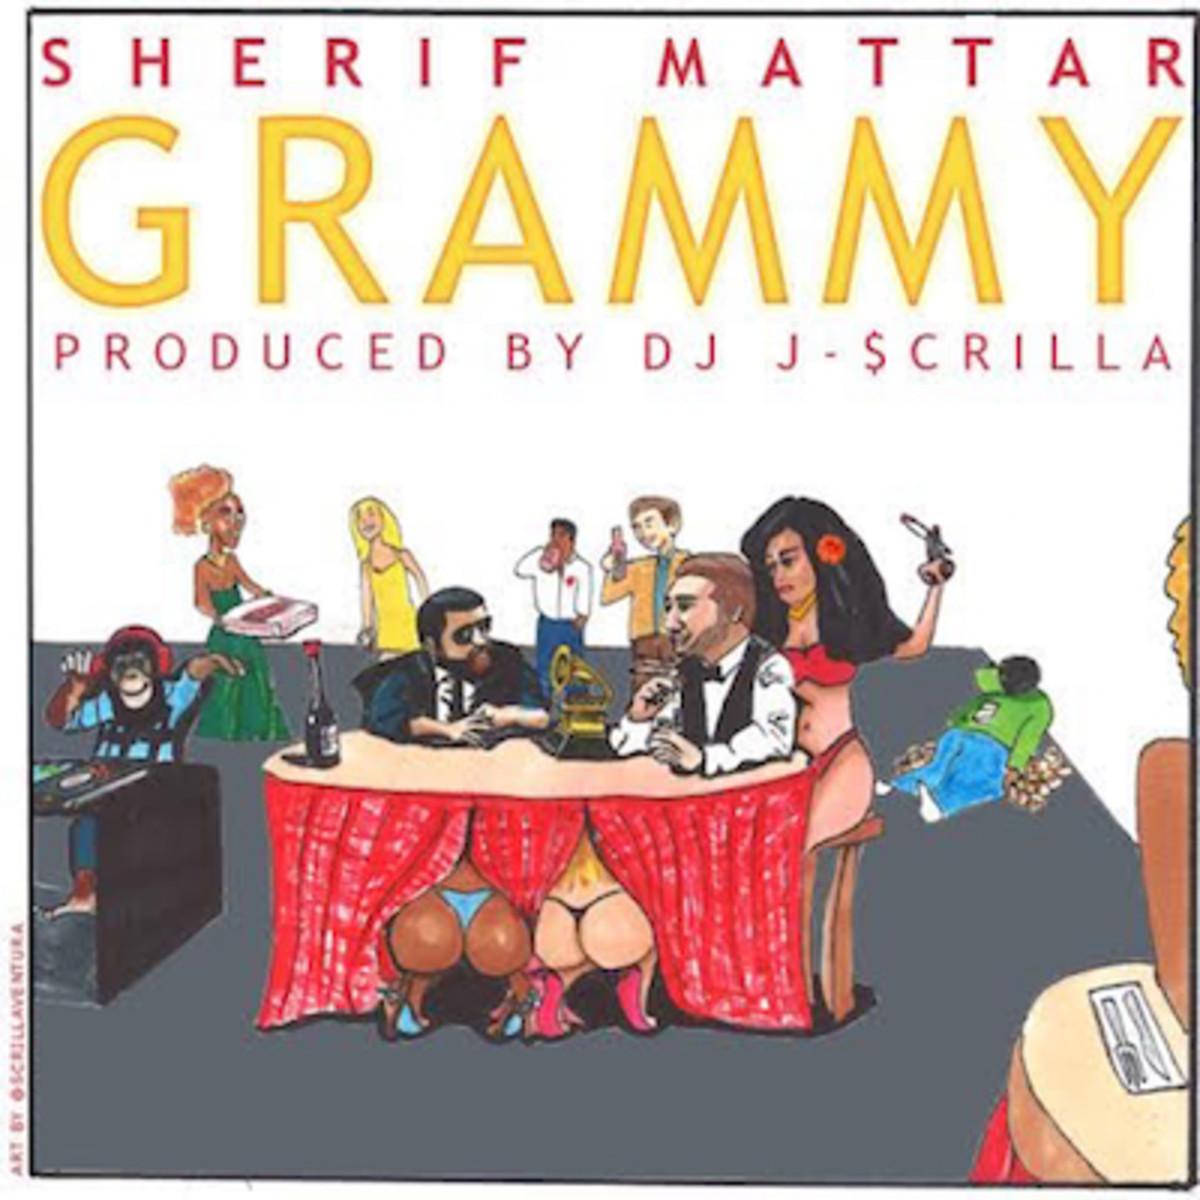 sherif-mattar-grammy.jpg